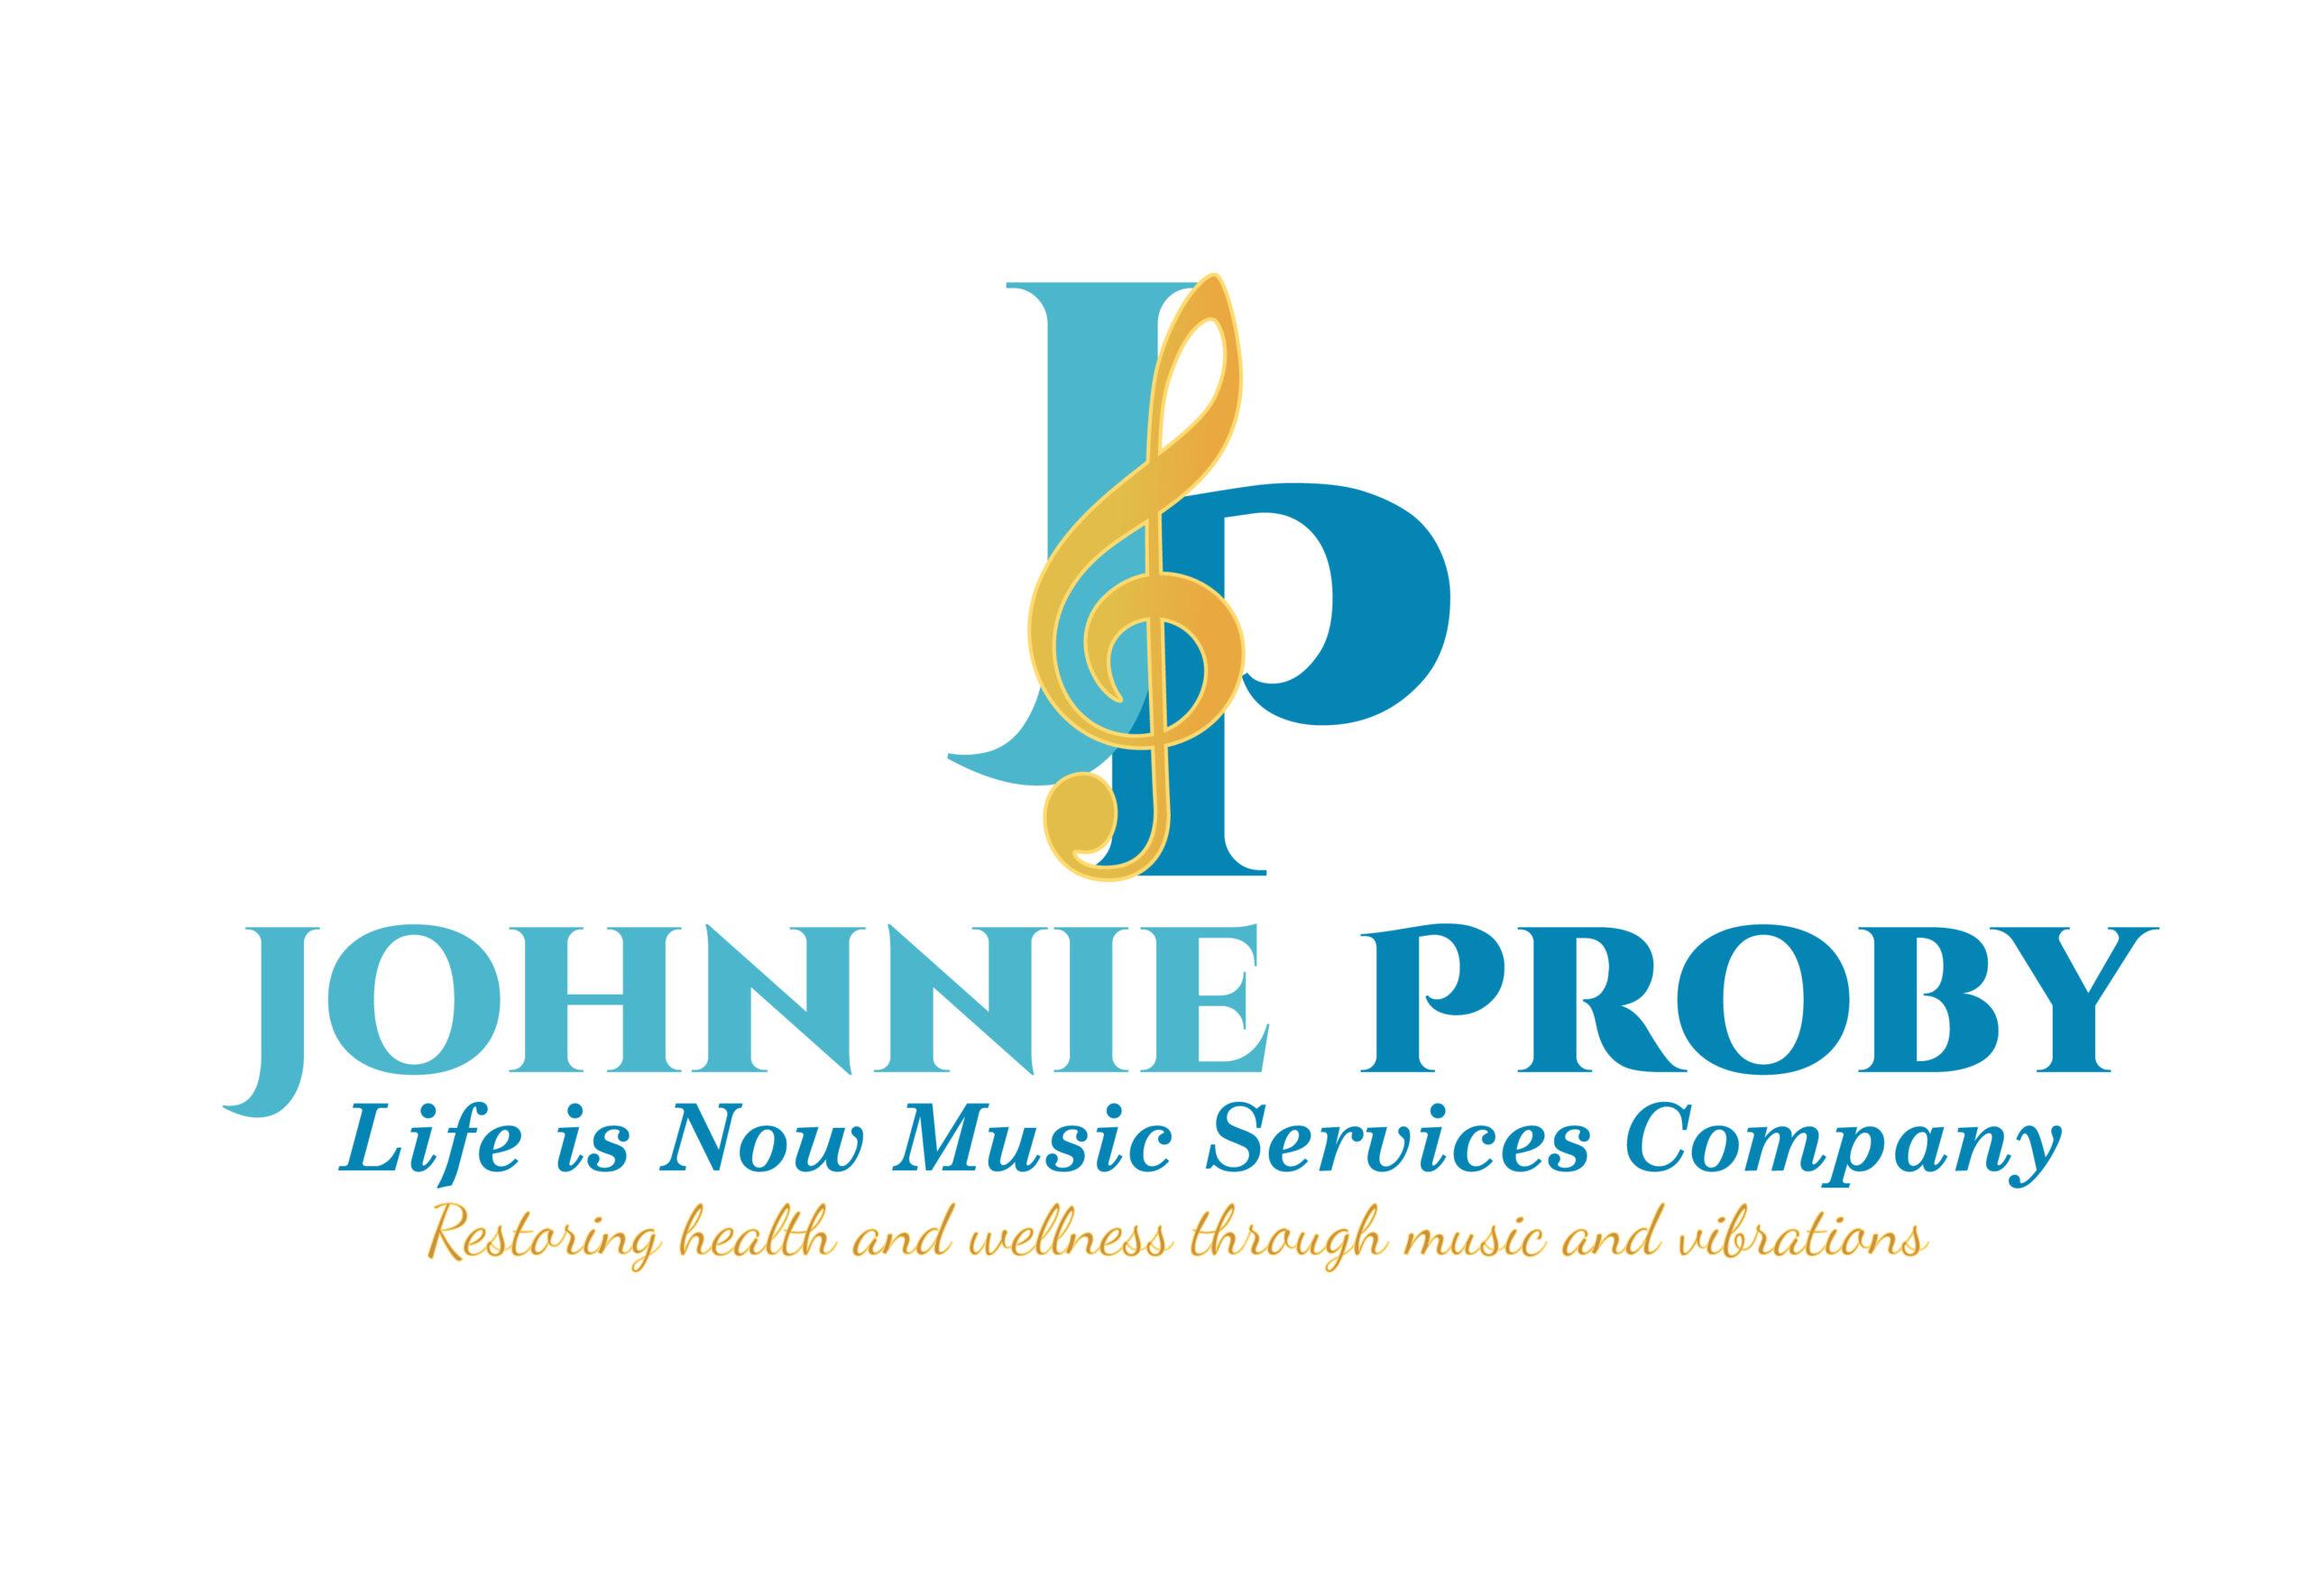 Johnnie Proby